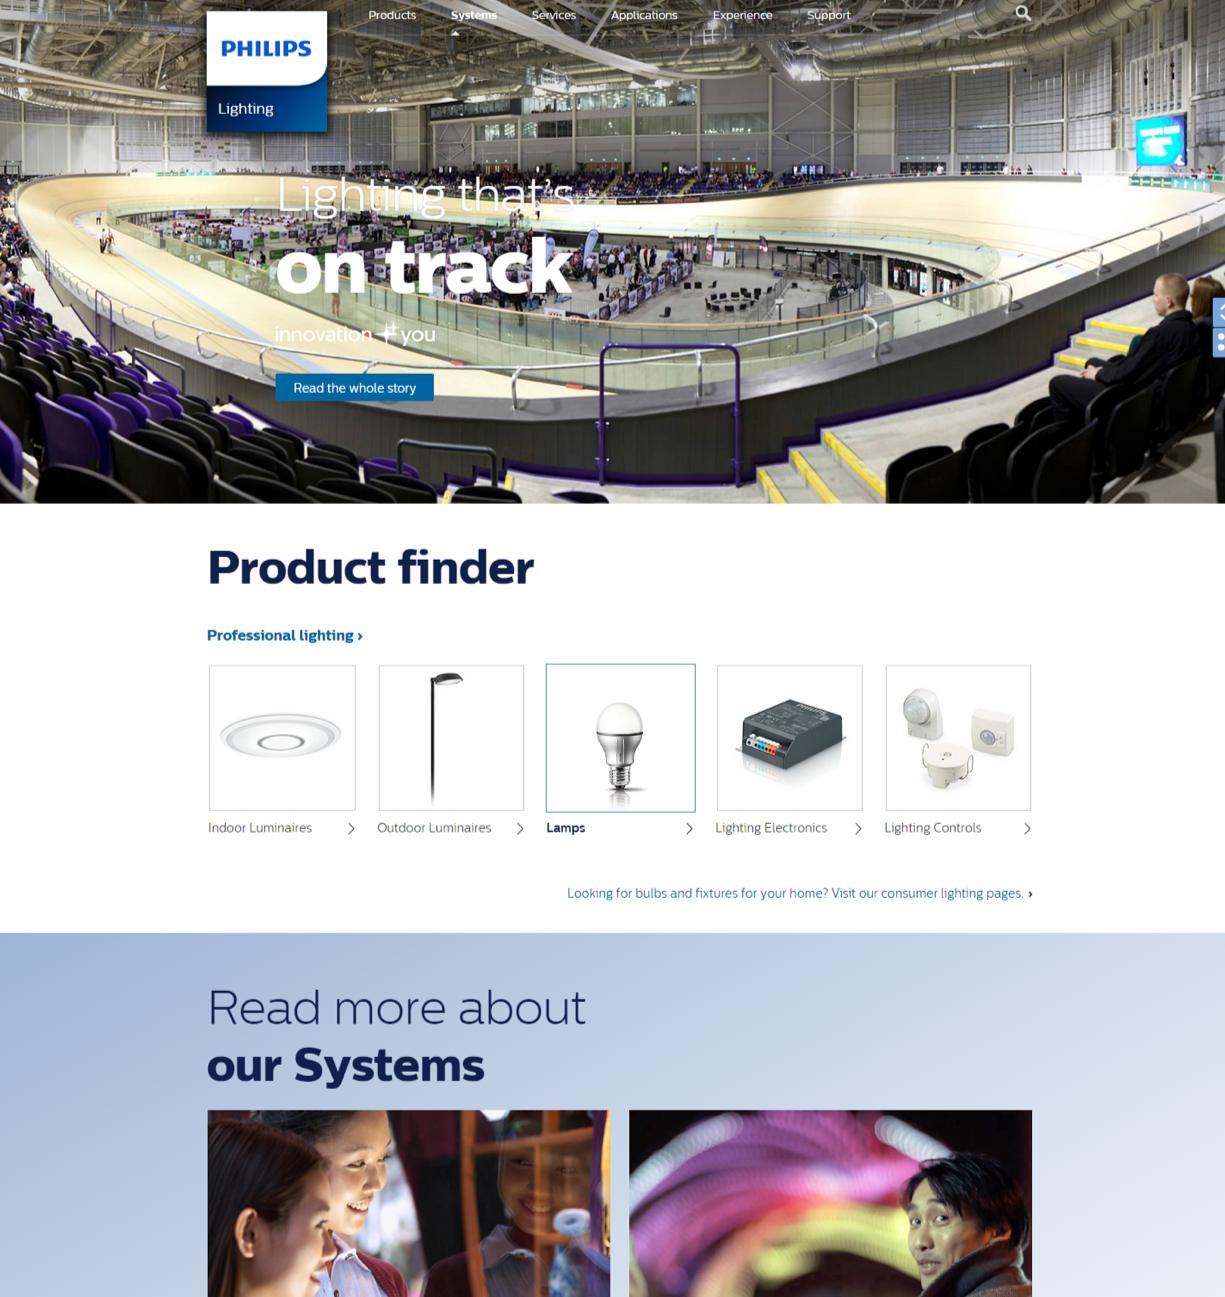 Digital Strategy & UX design - Philips Lighting